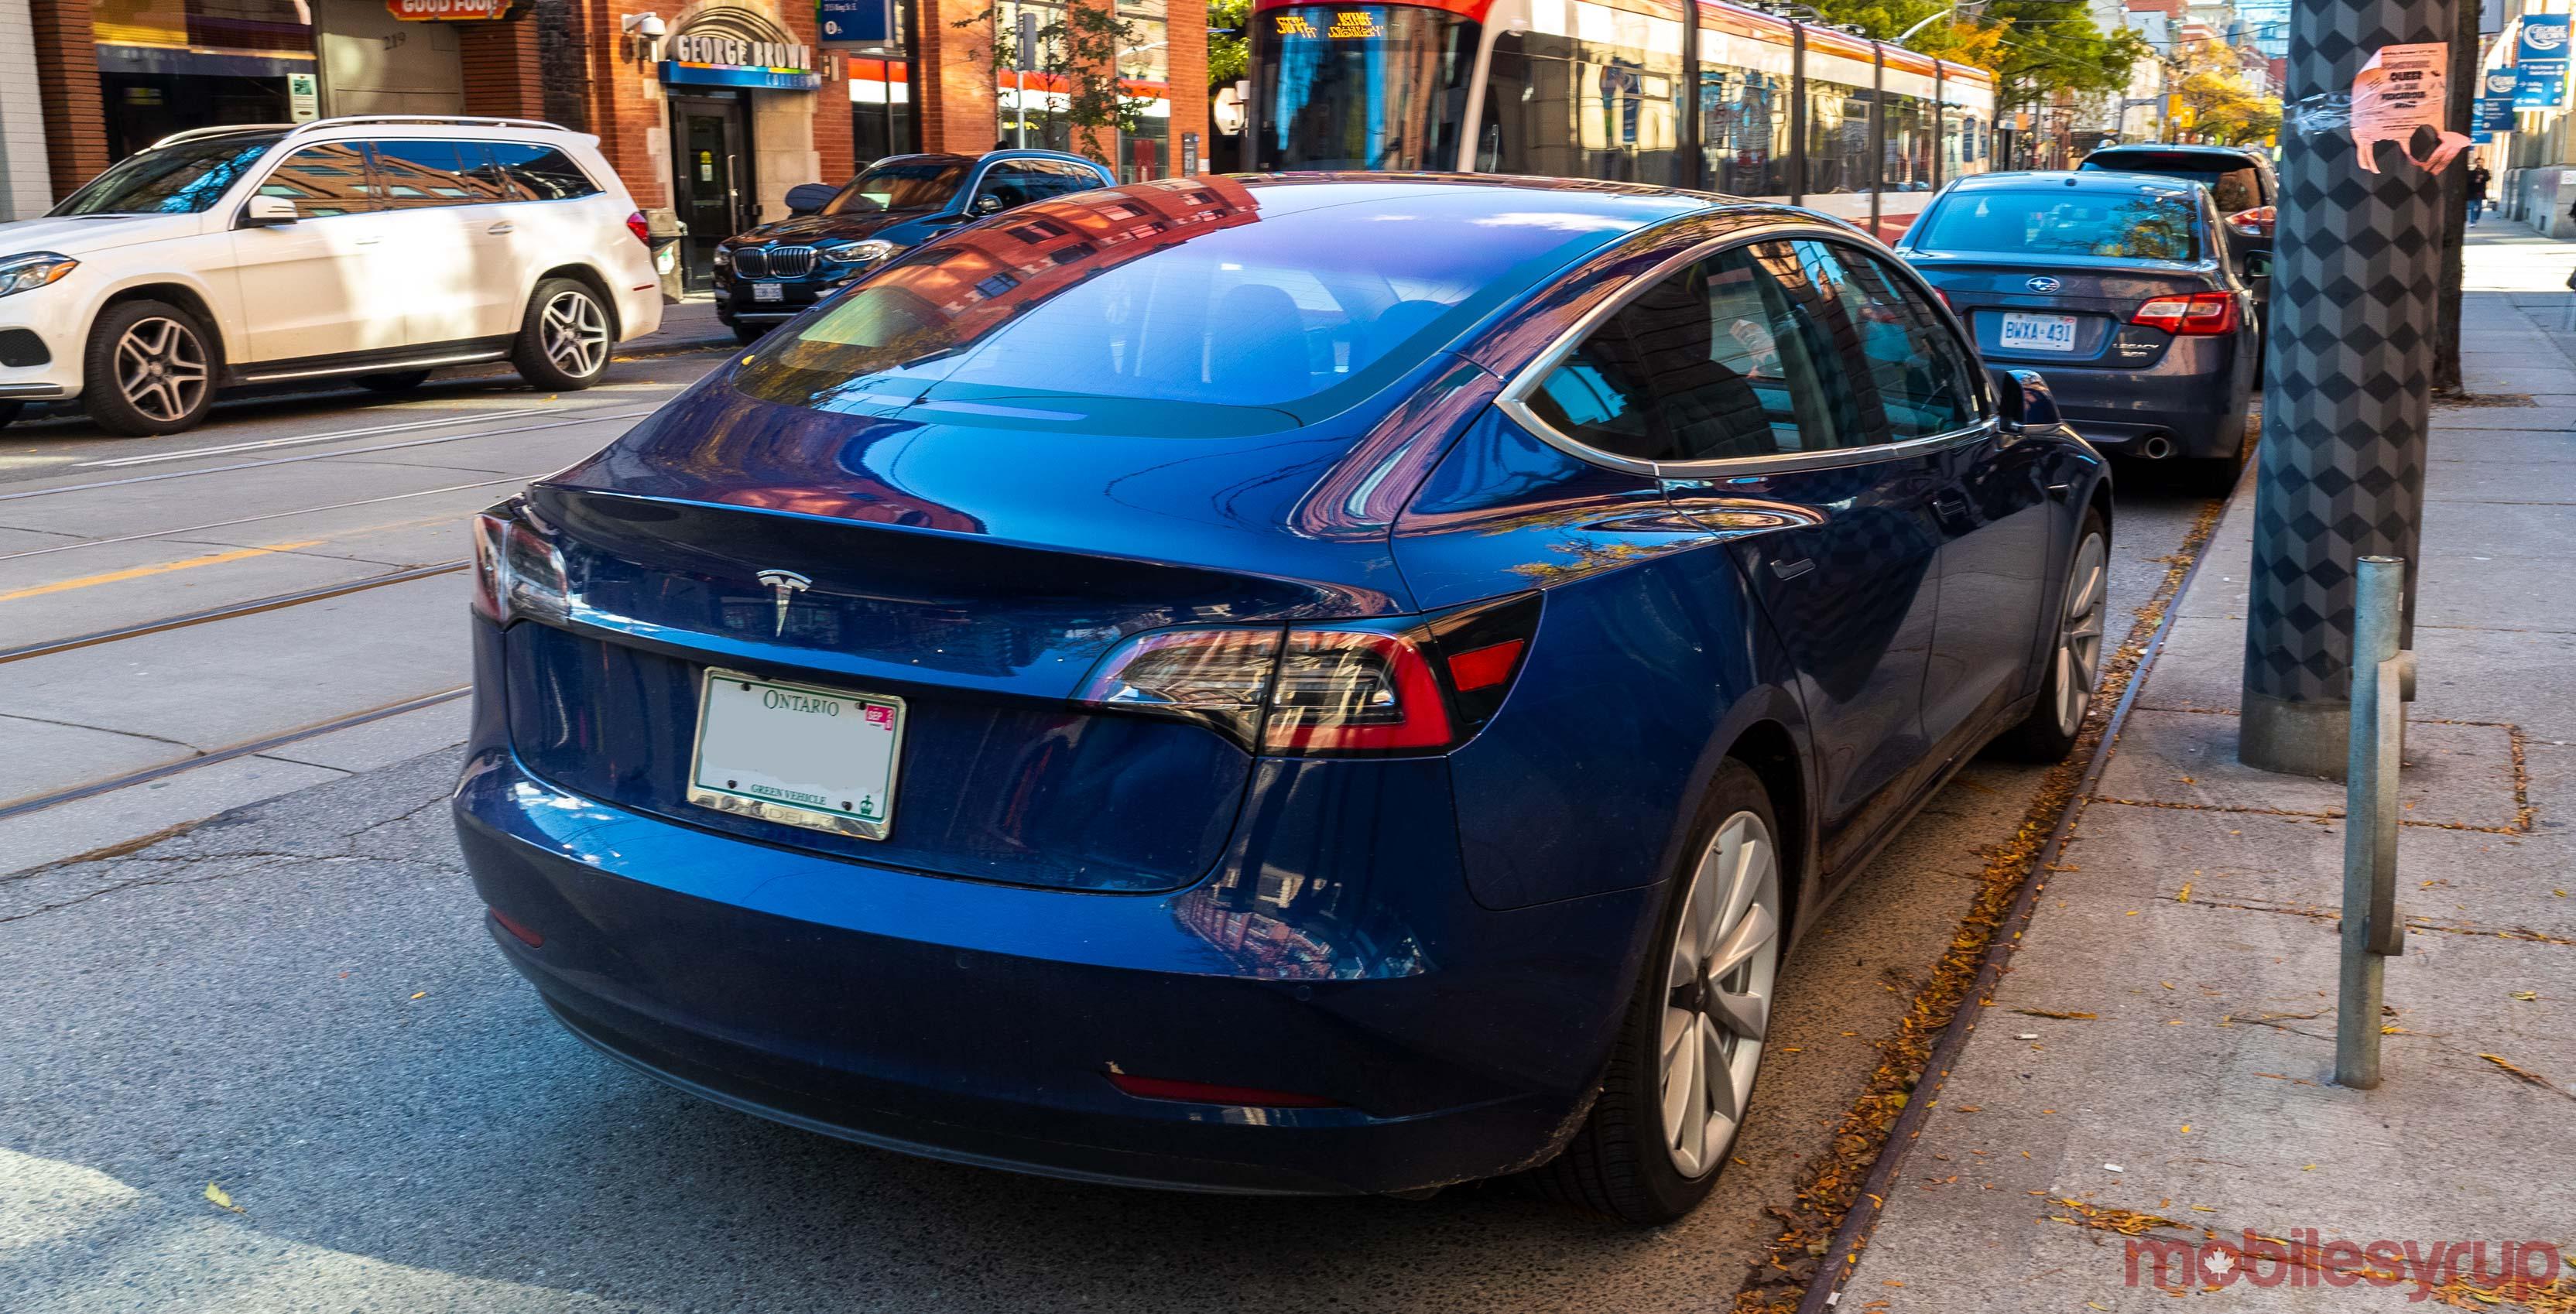 Tesla Might Not Meet Model 3 Production Goals In Q2